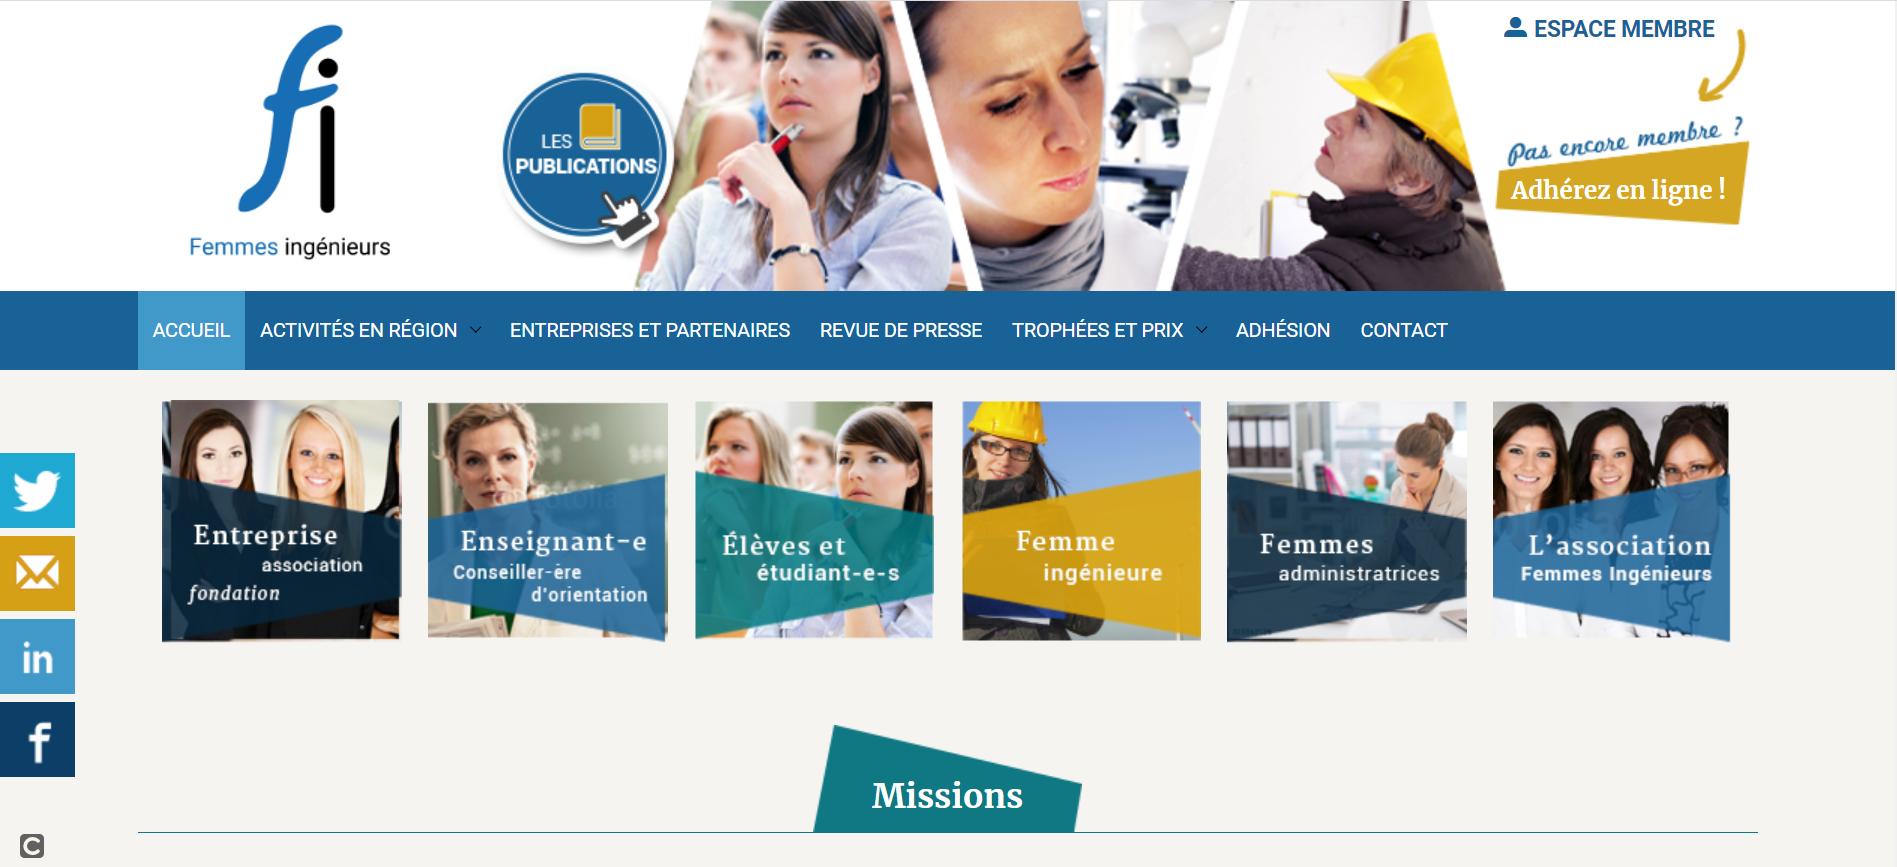 Association Femmes Ingénieures